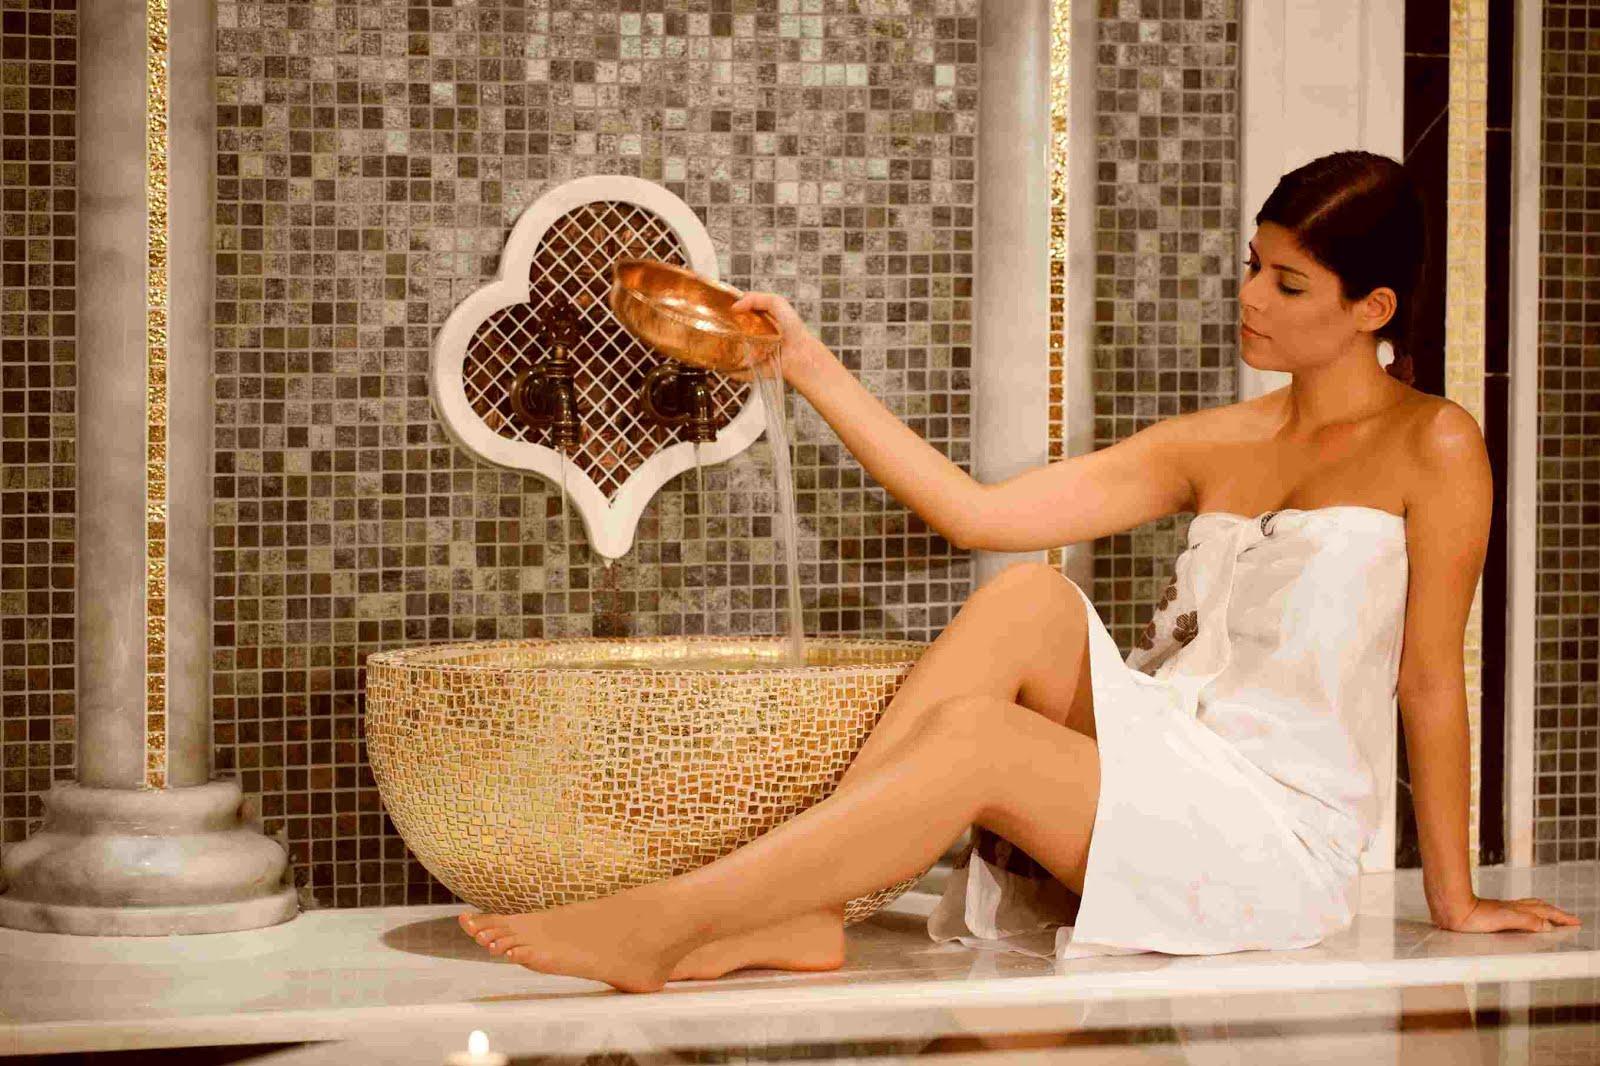 Турецкий баня хамам секс 9 фотография